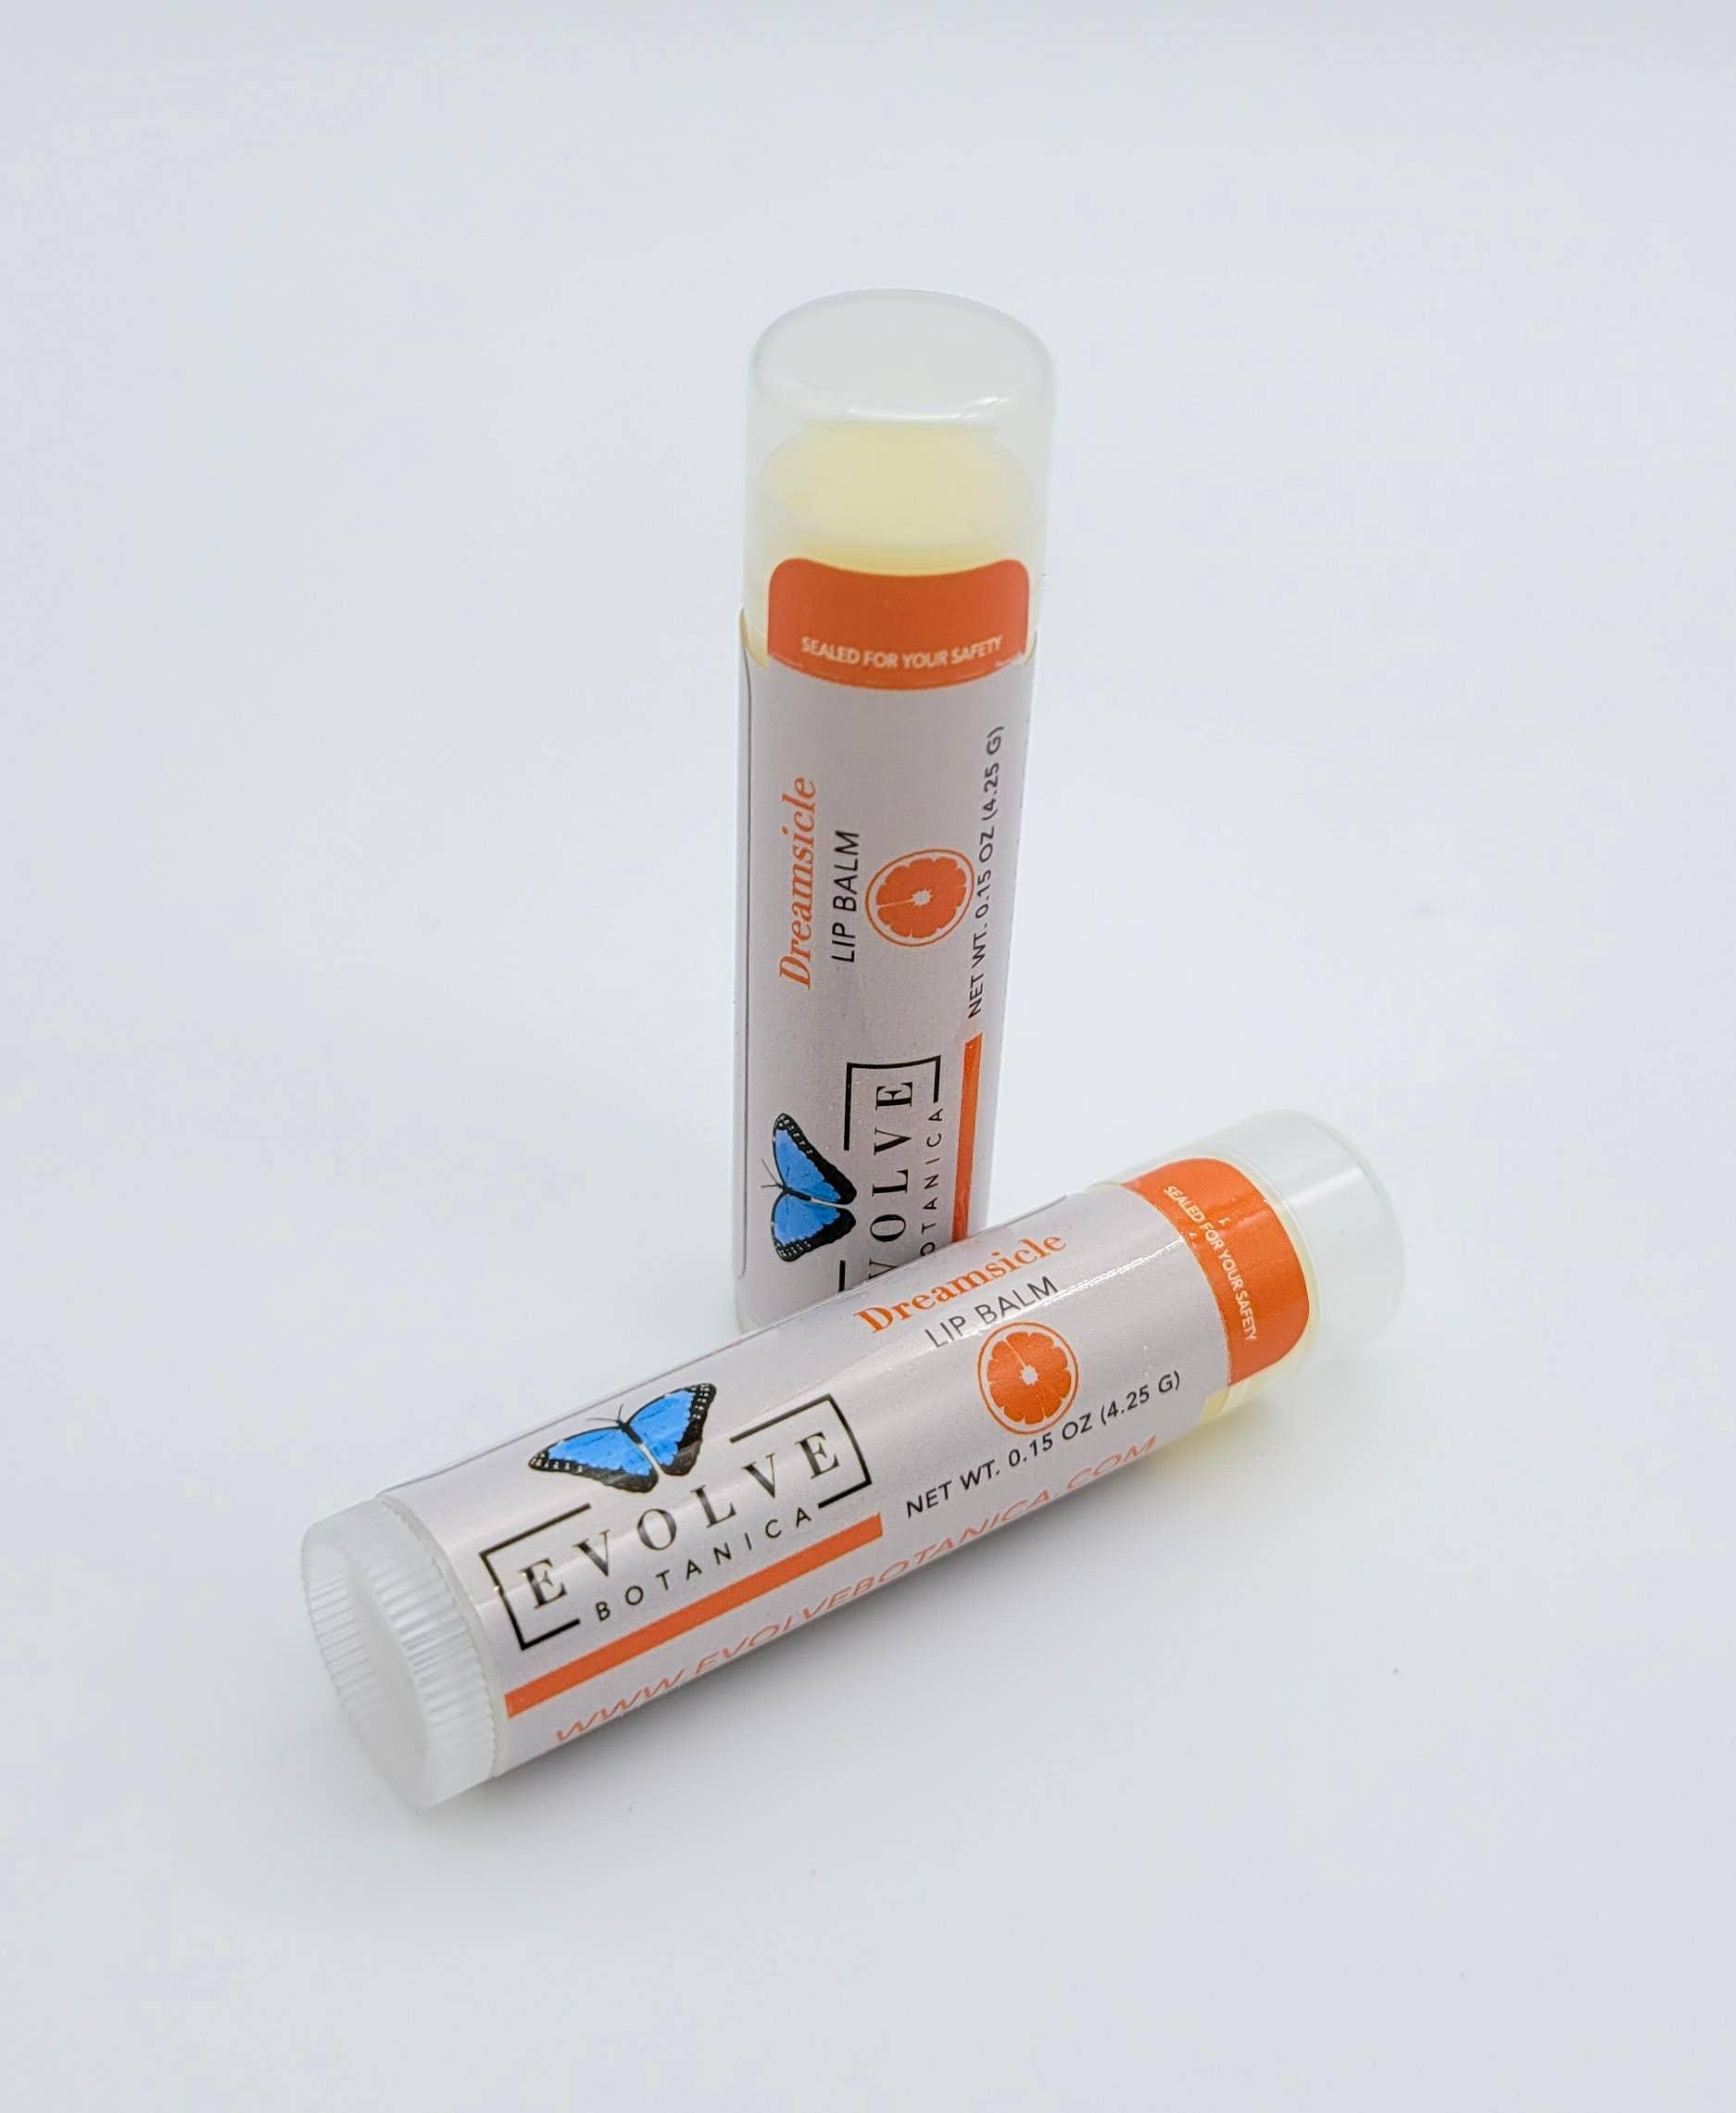 Evolve - Lip Balm - Dreamsicle | Trada Marketplace